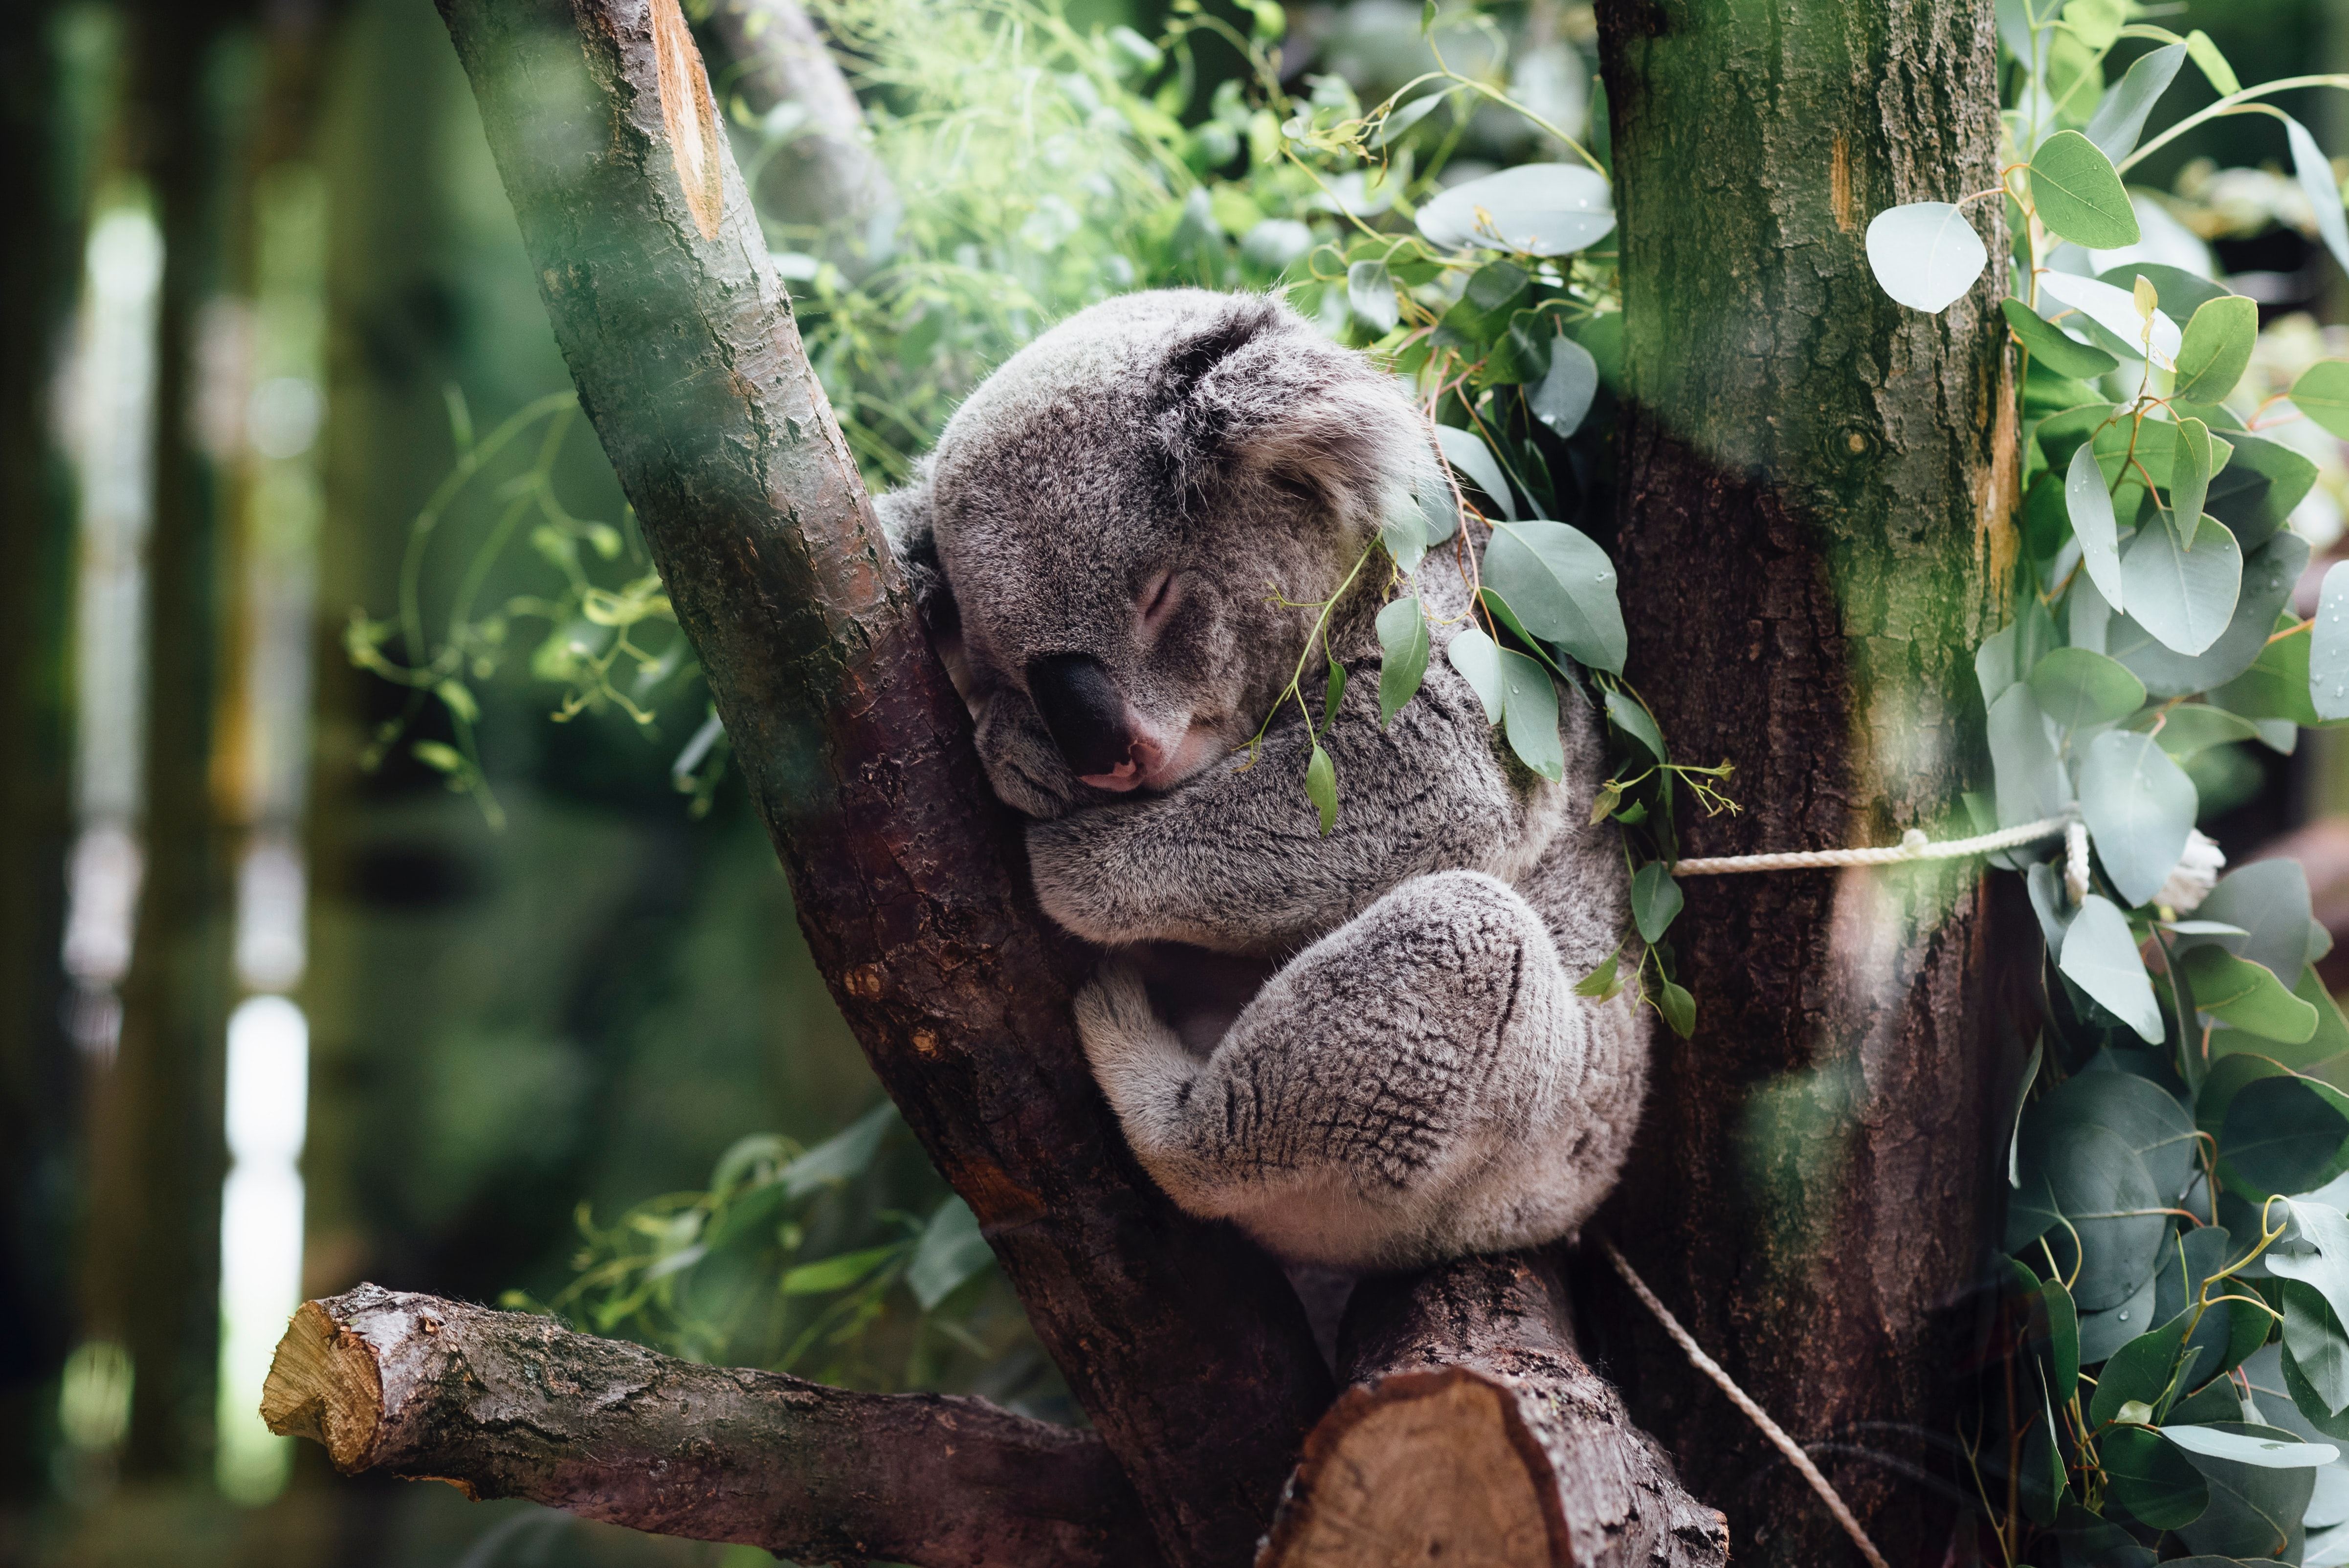 A koala sleeps in a tree. Photo courtesy of Jordan Whitt on Unsplash.